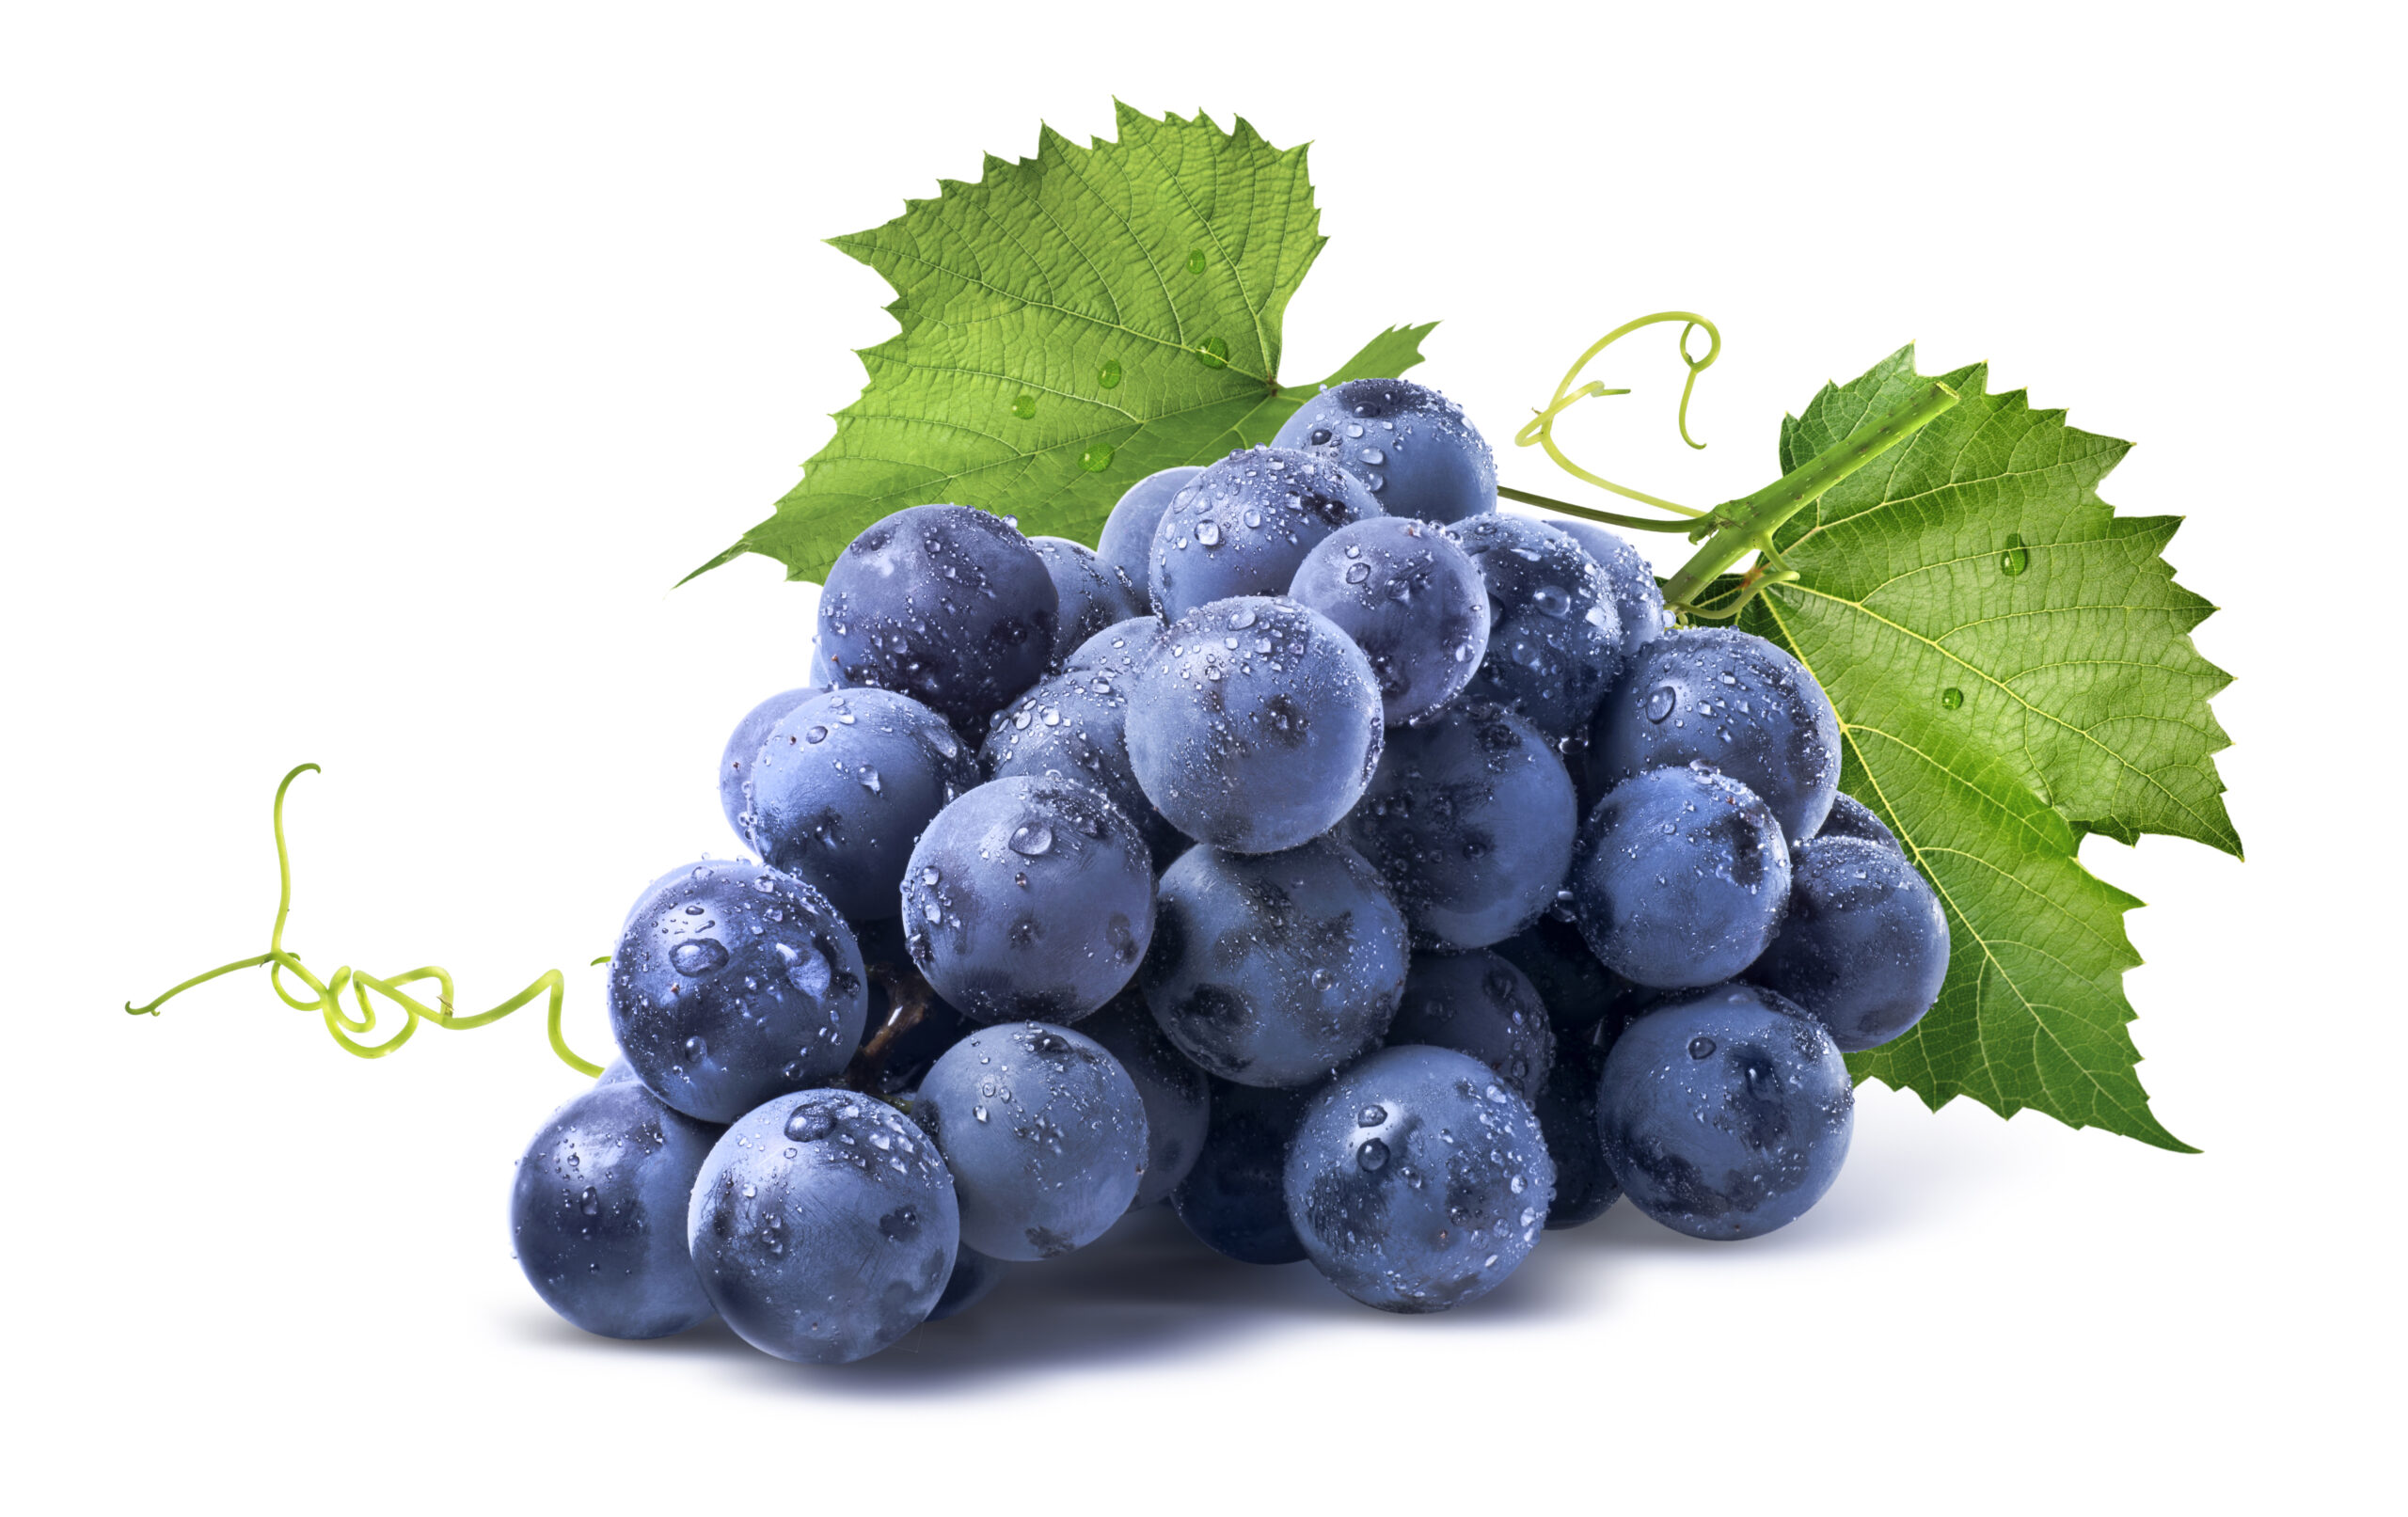 Mount Natural OPC PURE Antioxidant Alles über OPC Wissenswertes über OPC